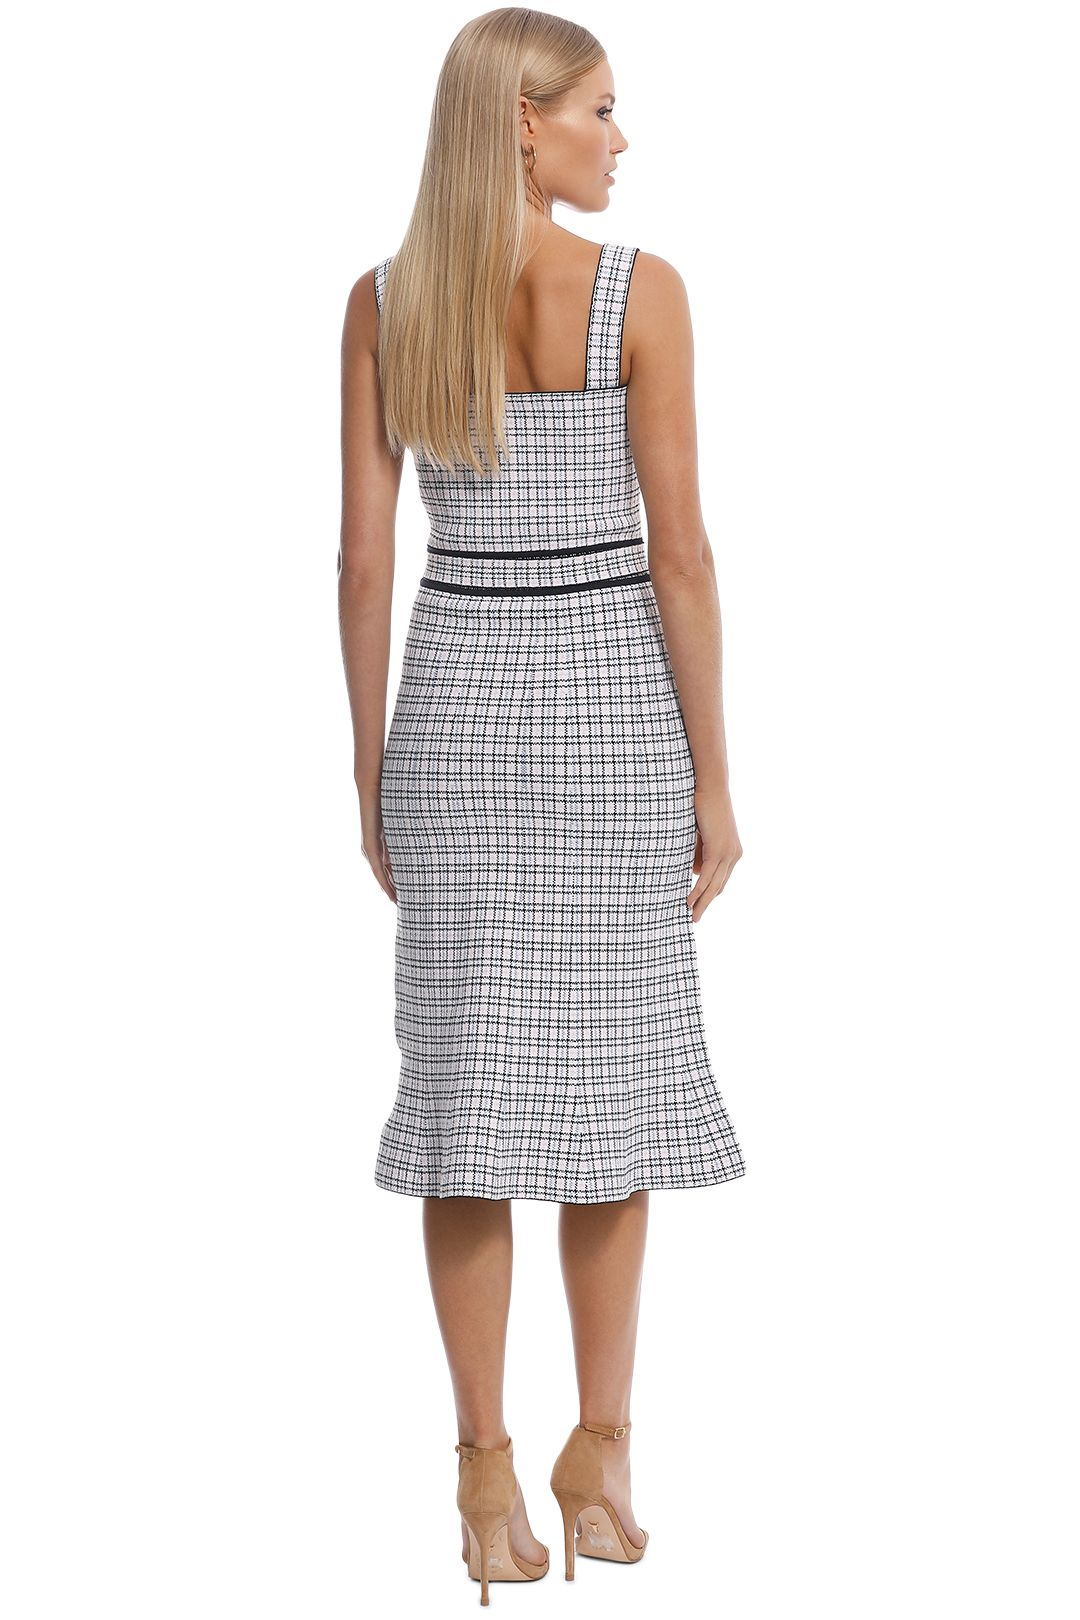 Scanlan Theodore - Crepe Knit Plaid Bralette Dress - Pale Pink - Back